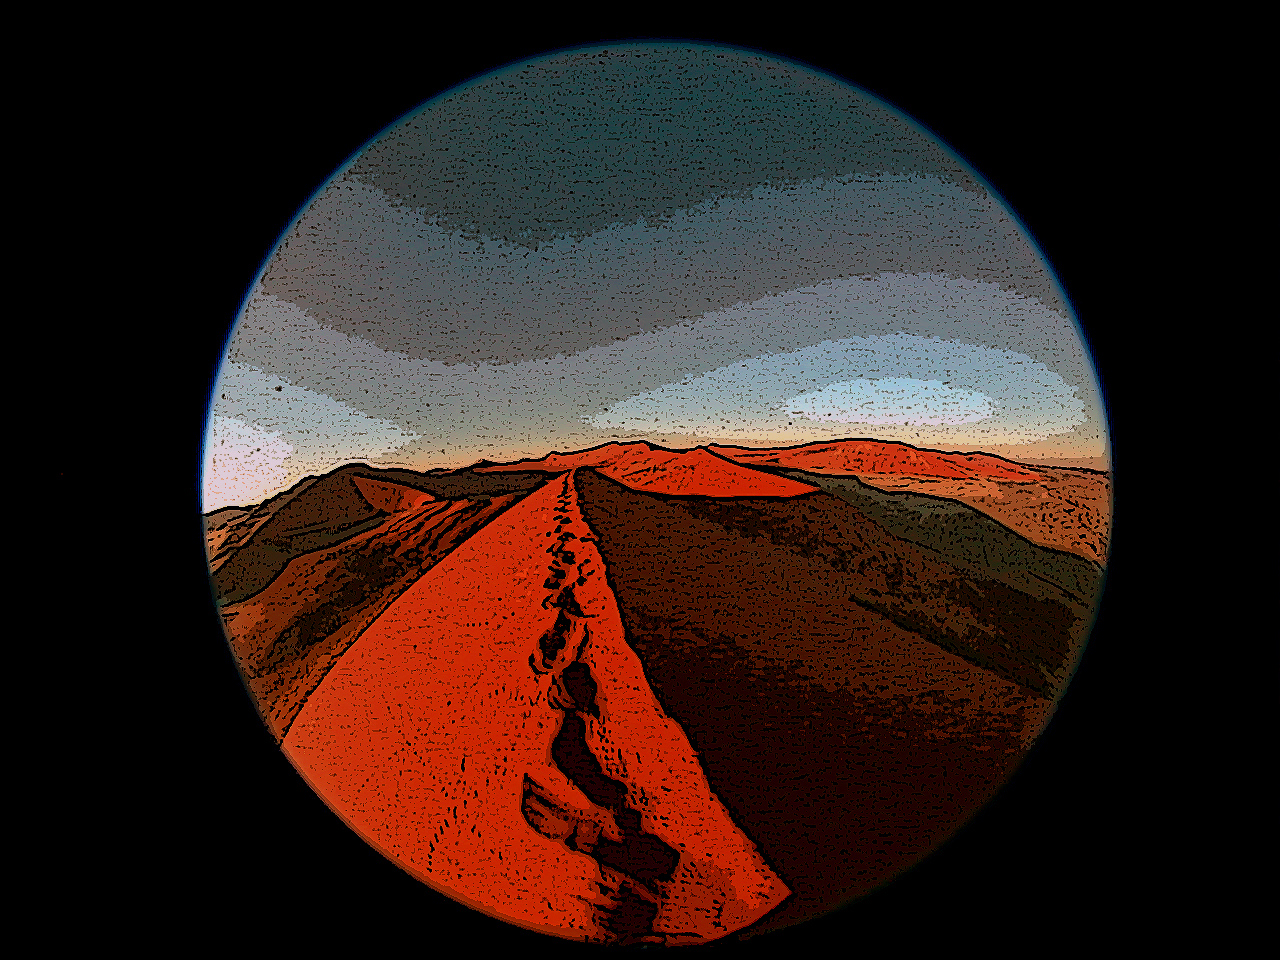 dune45-posterized 2 072